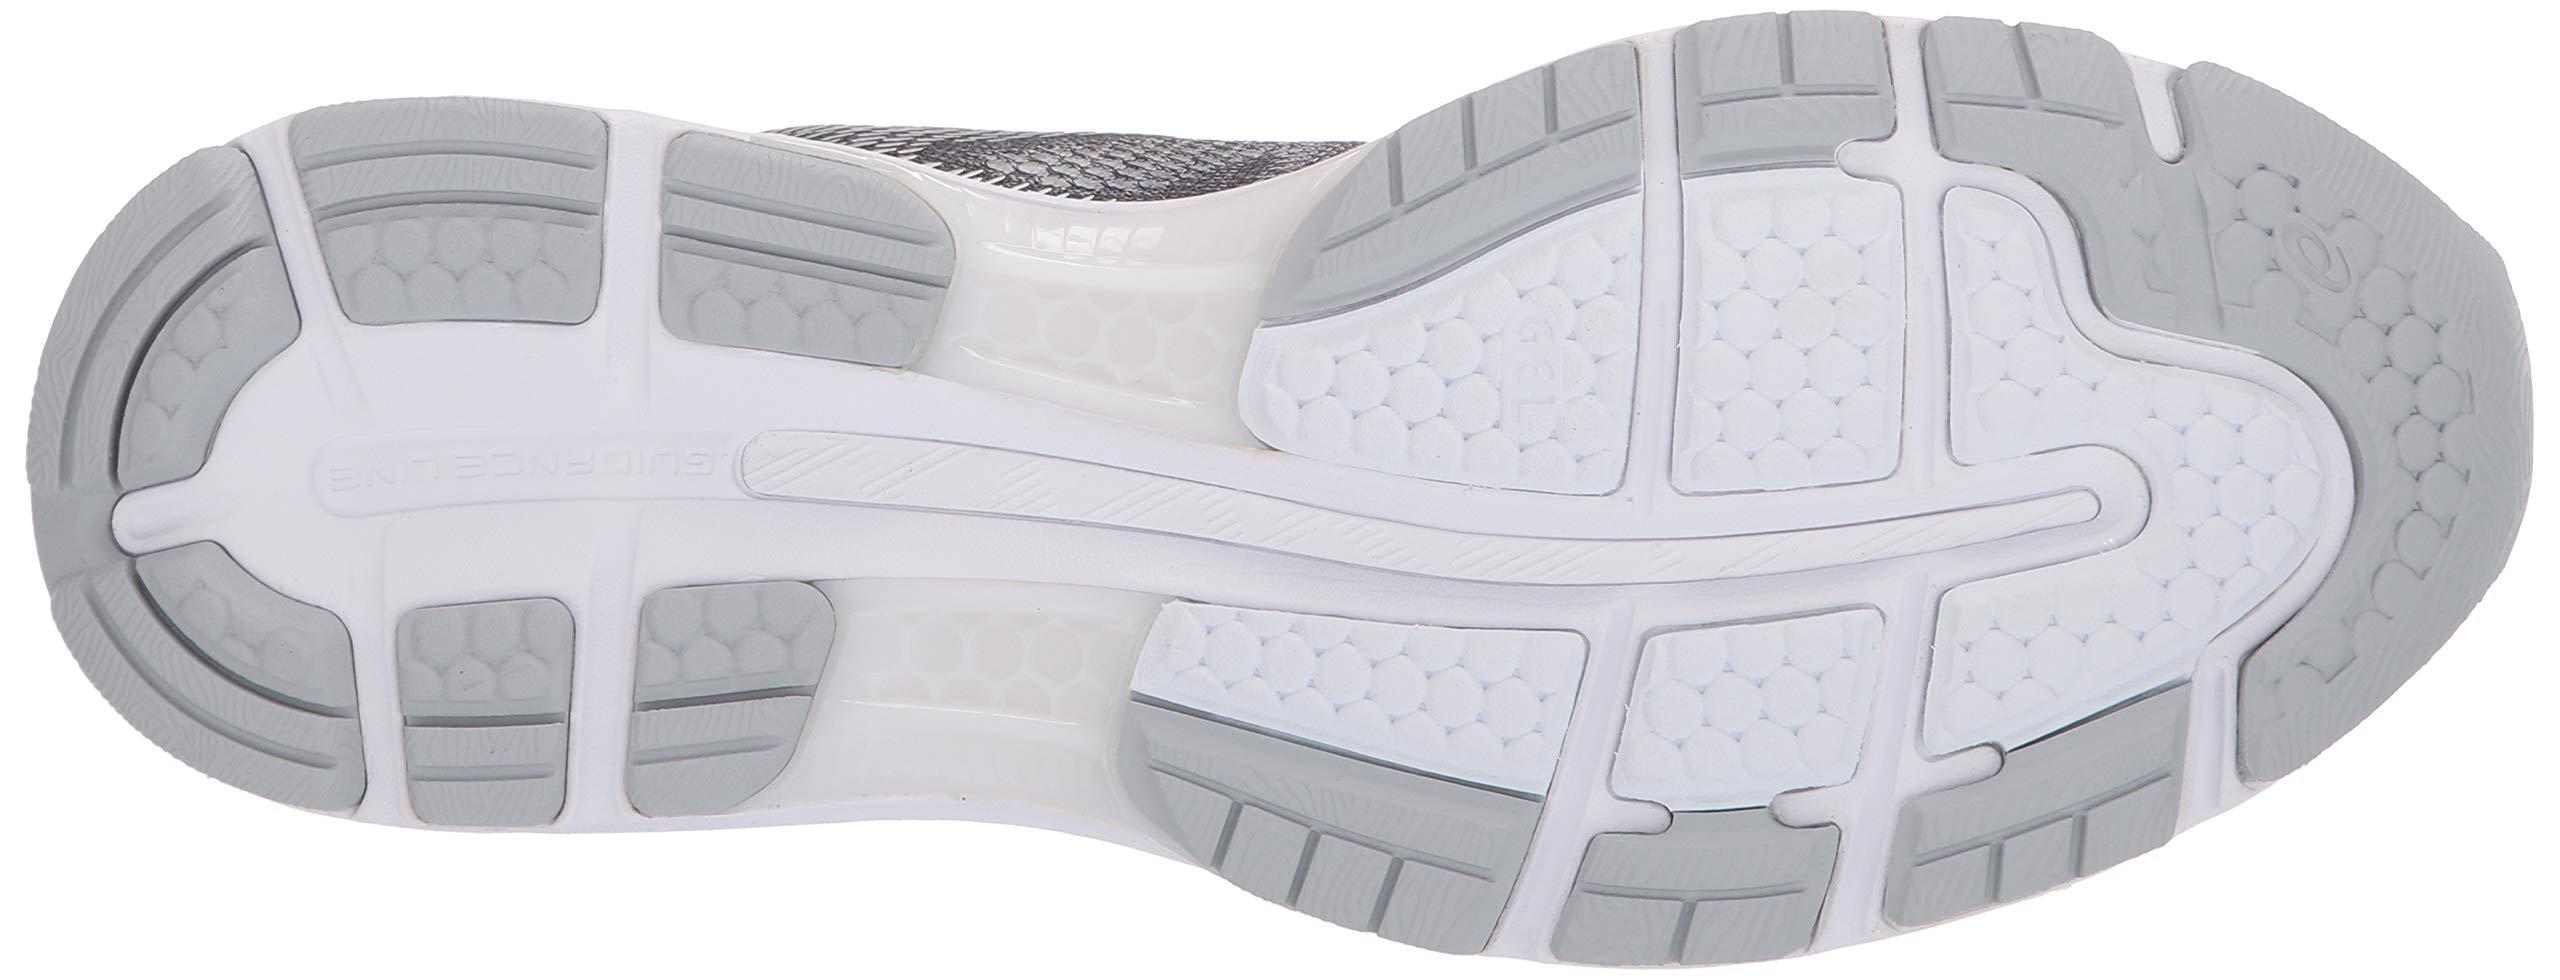 ASICS Mens Fitness/Cross-Training Trail Running Shoe, Carbon/Silver/White, 7 Medium US by ASICS (Image #3)